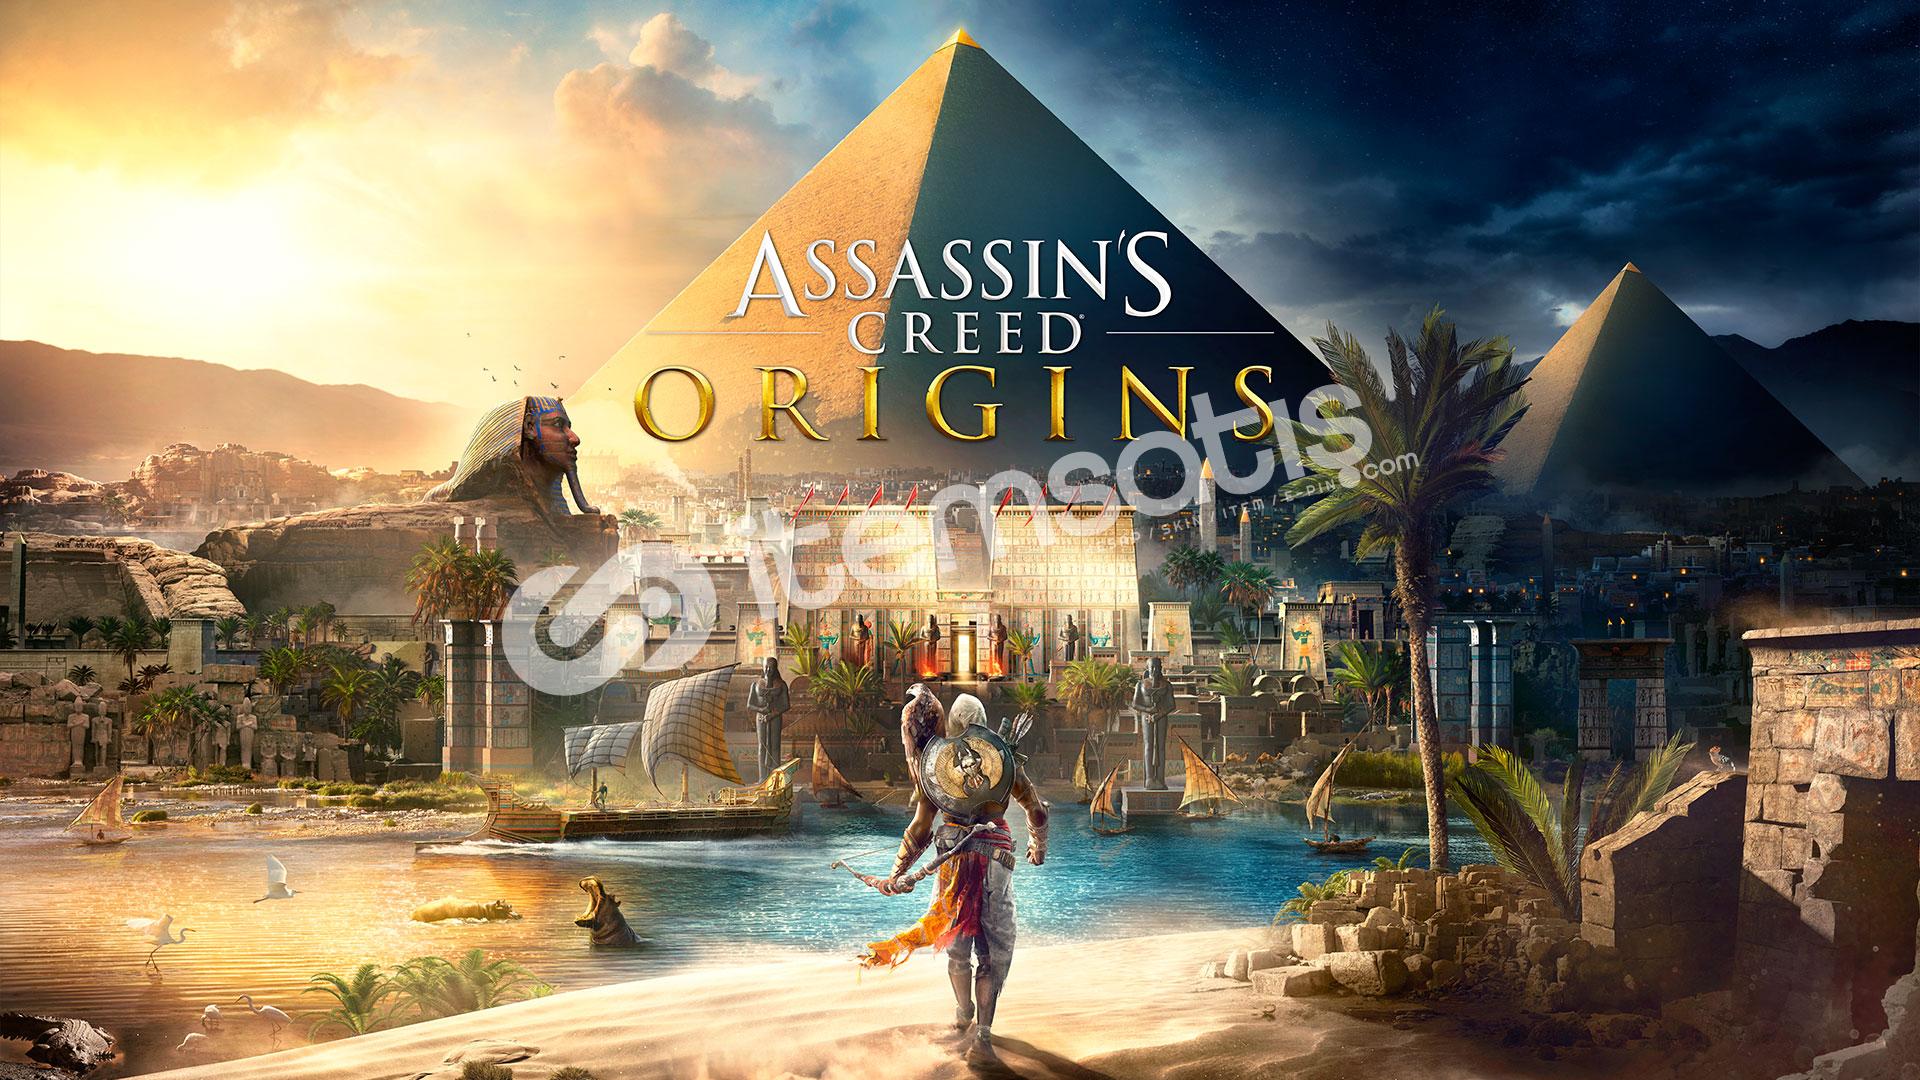 Assassin's Creed Origins + HEDİYE + GARANTİ + GEFORCE NOW